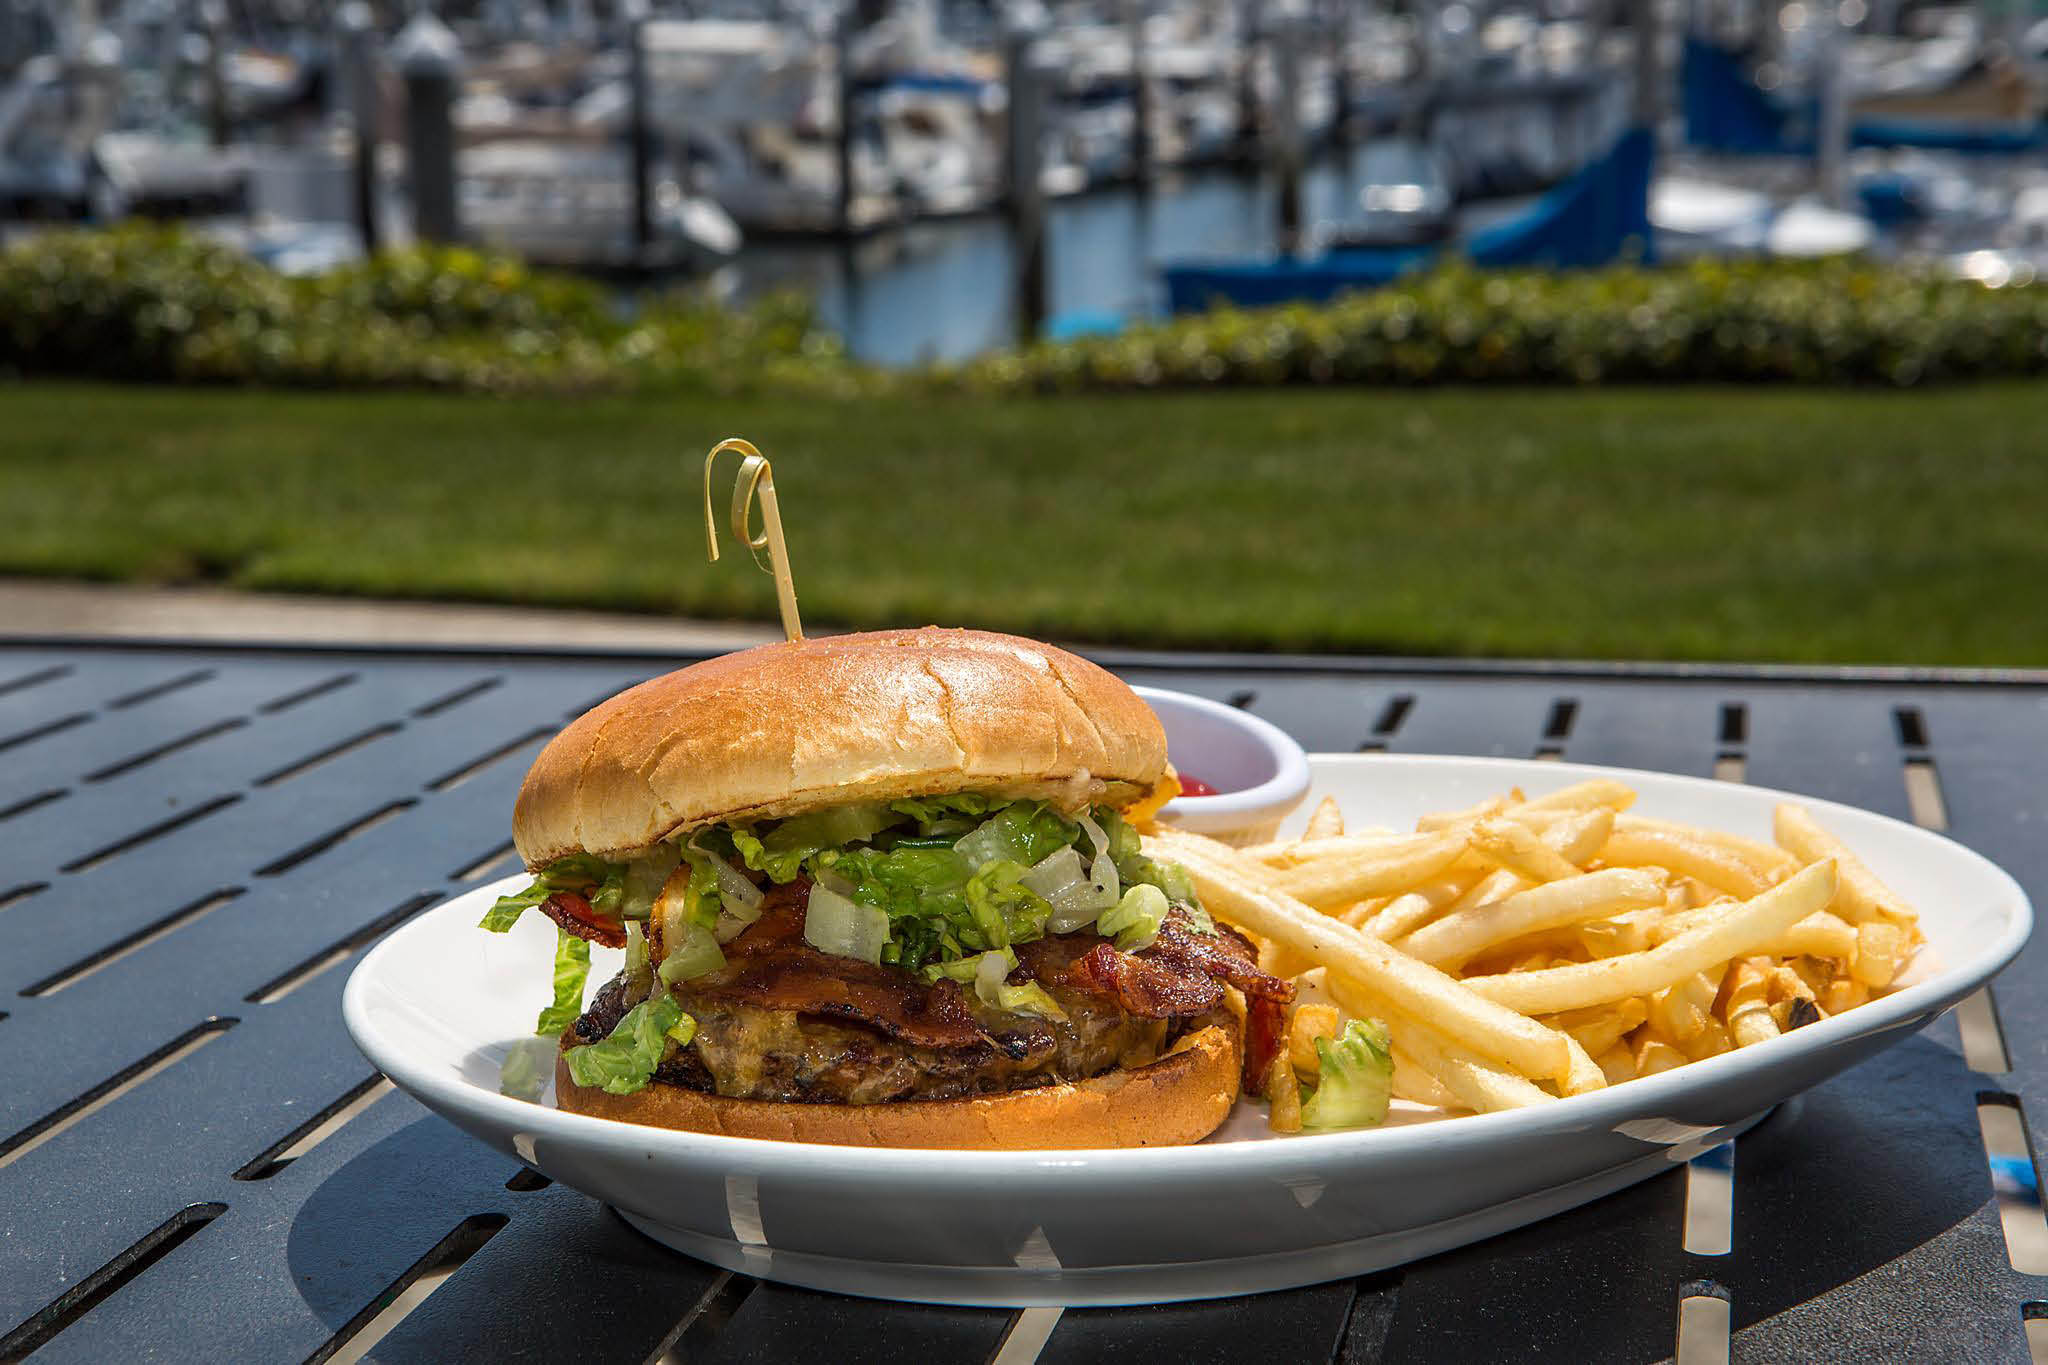 Maggie Bluffs Marina Grill - Seattle, WA - hamburgers - sandwiches - great views of the Seattle waterfront - Seattle restaurants